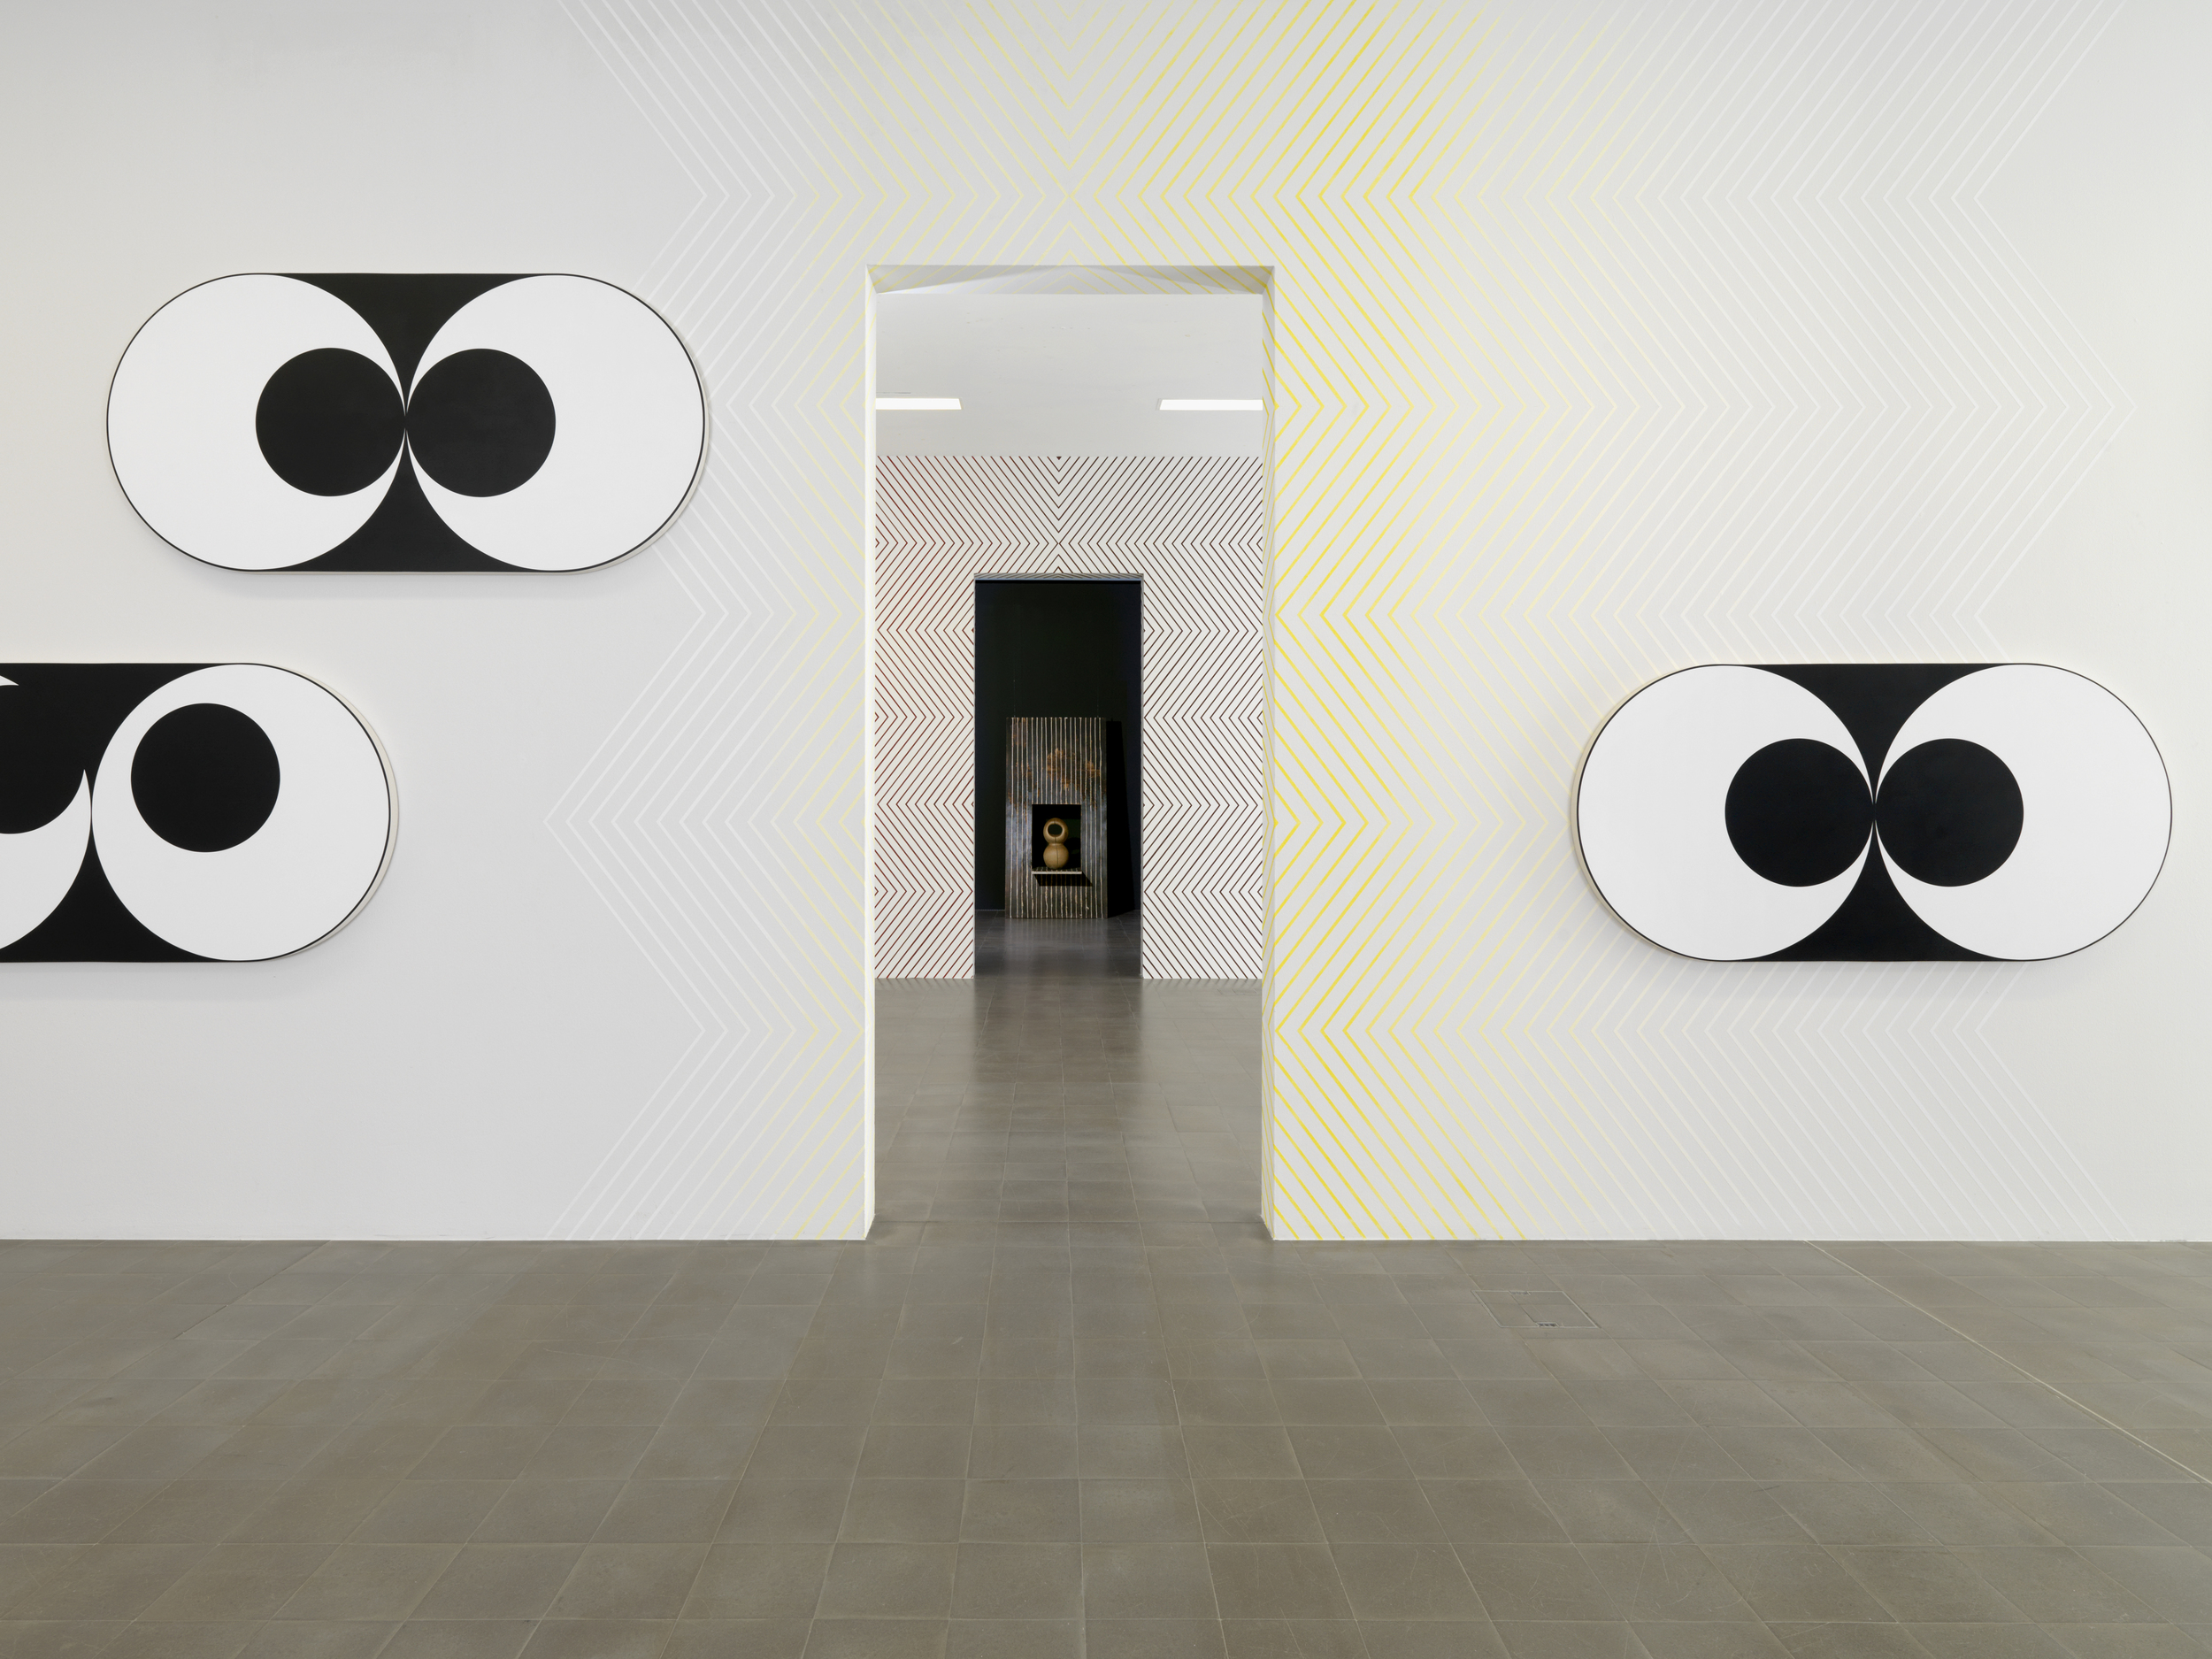 Pasquart, Bienne | Claudia Comte | 2013